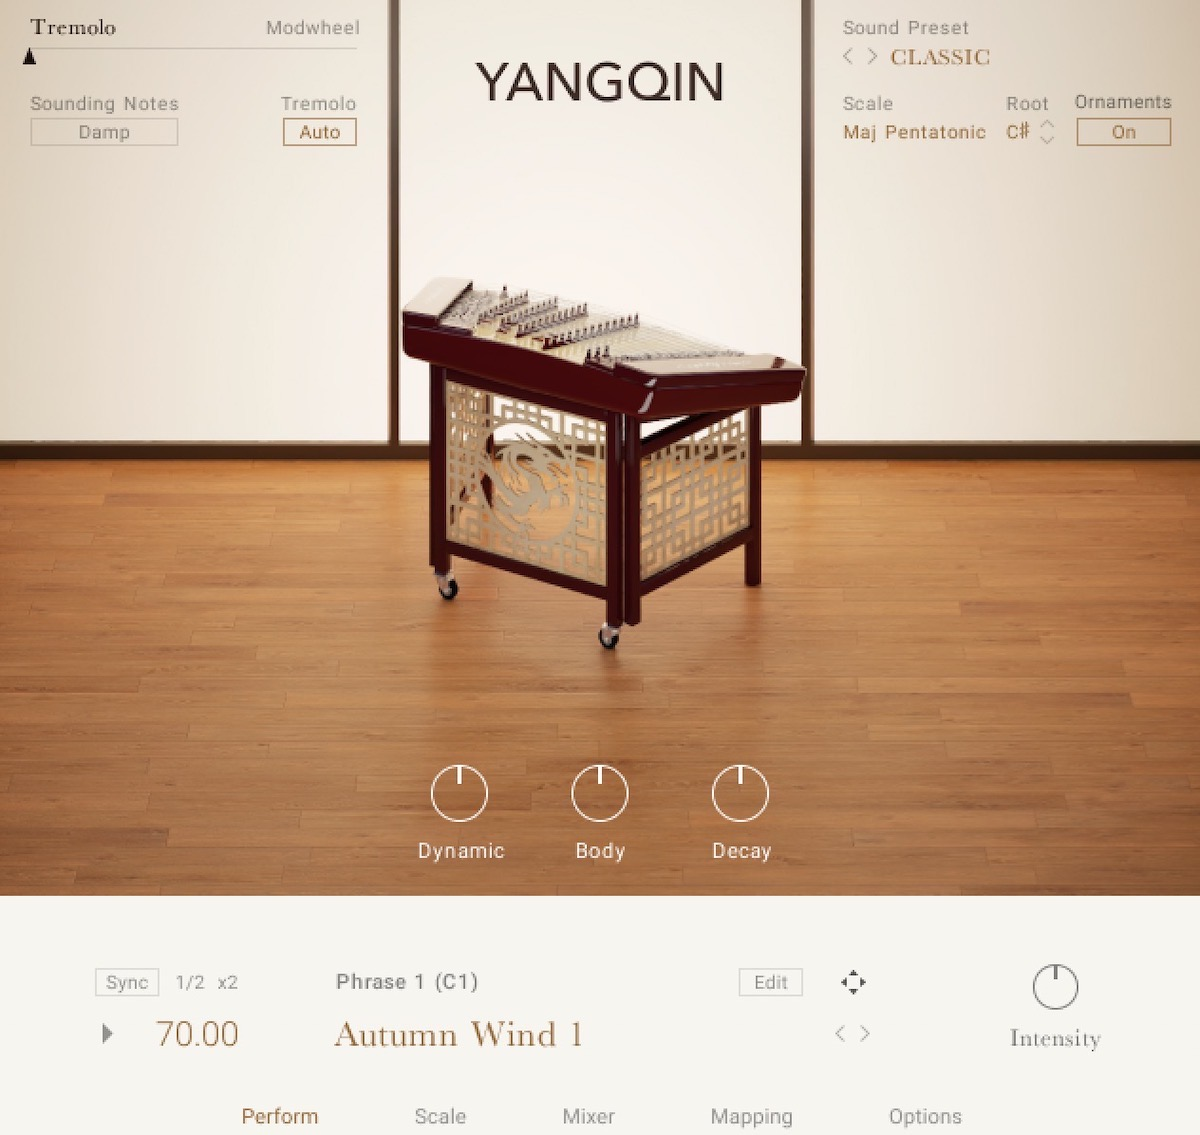 Yangqin1